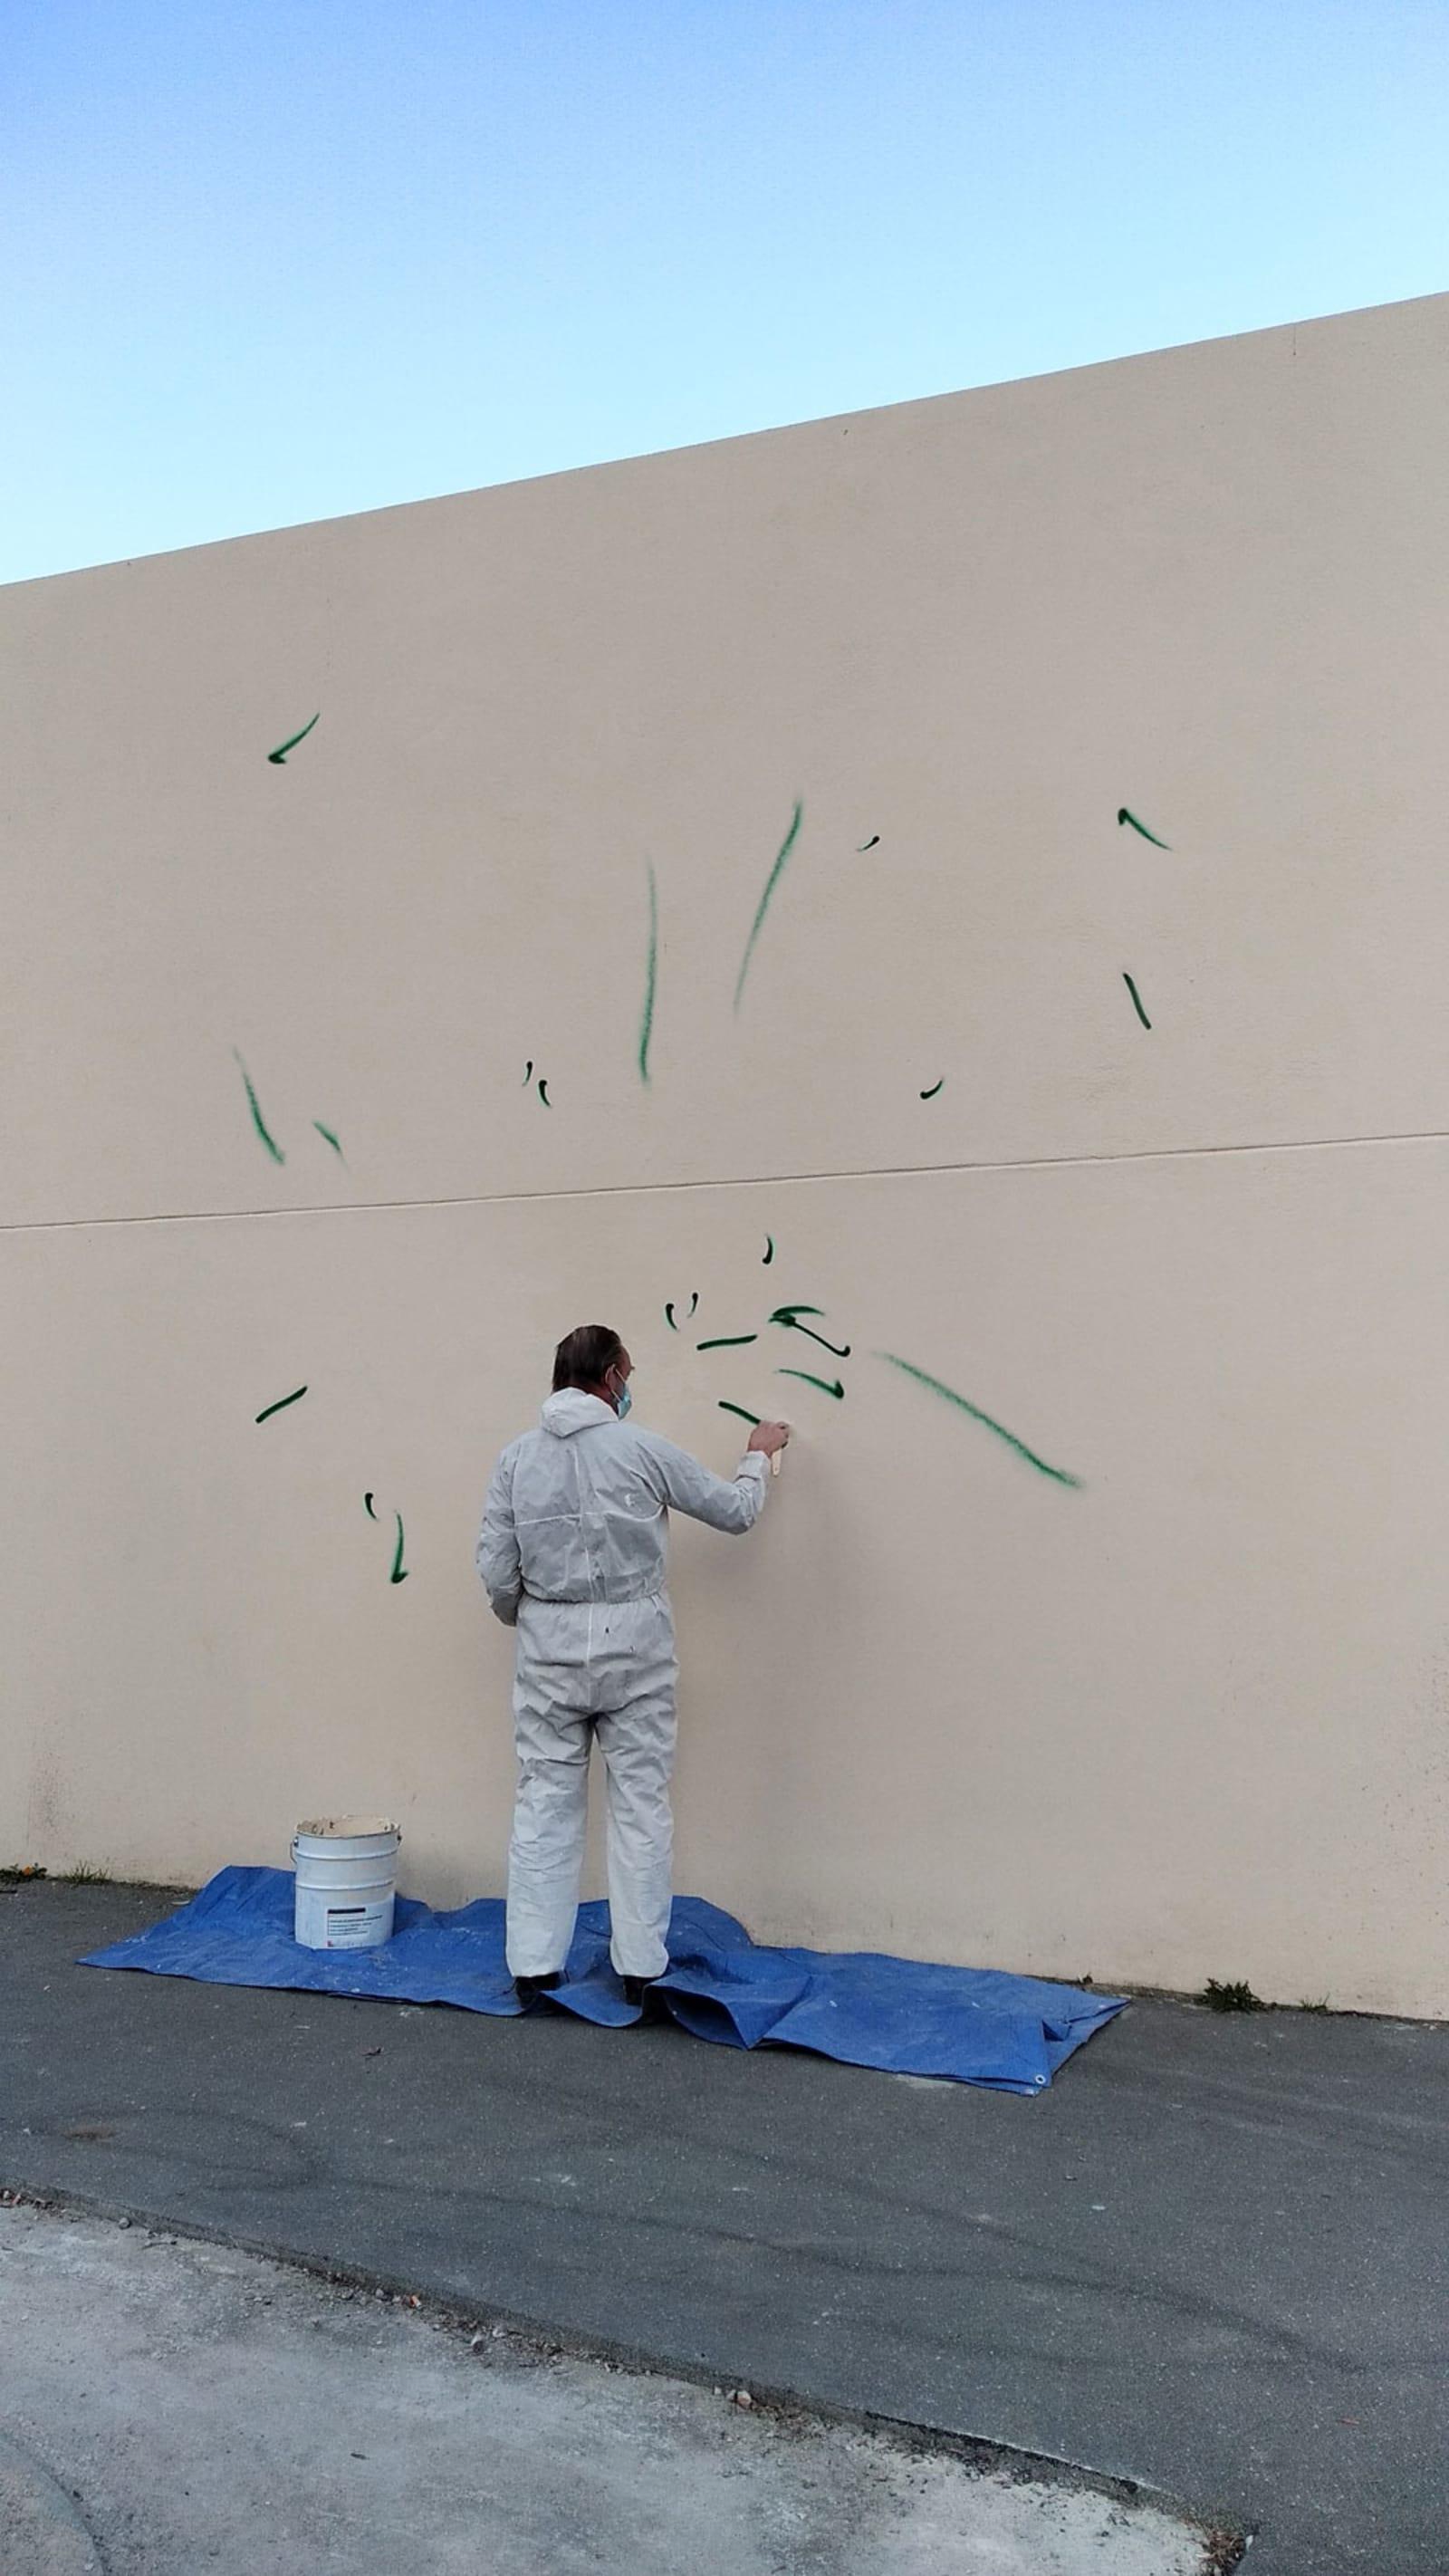 l'homme peint - a man is painting a wall with tiny graffiti - homme, peinture, mur, graffiti - paul lahana